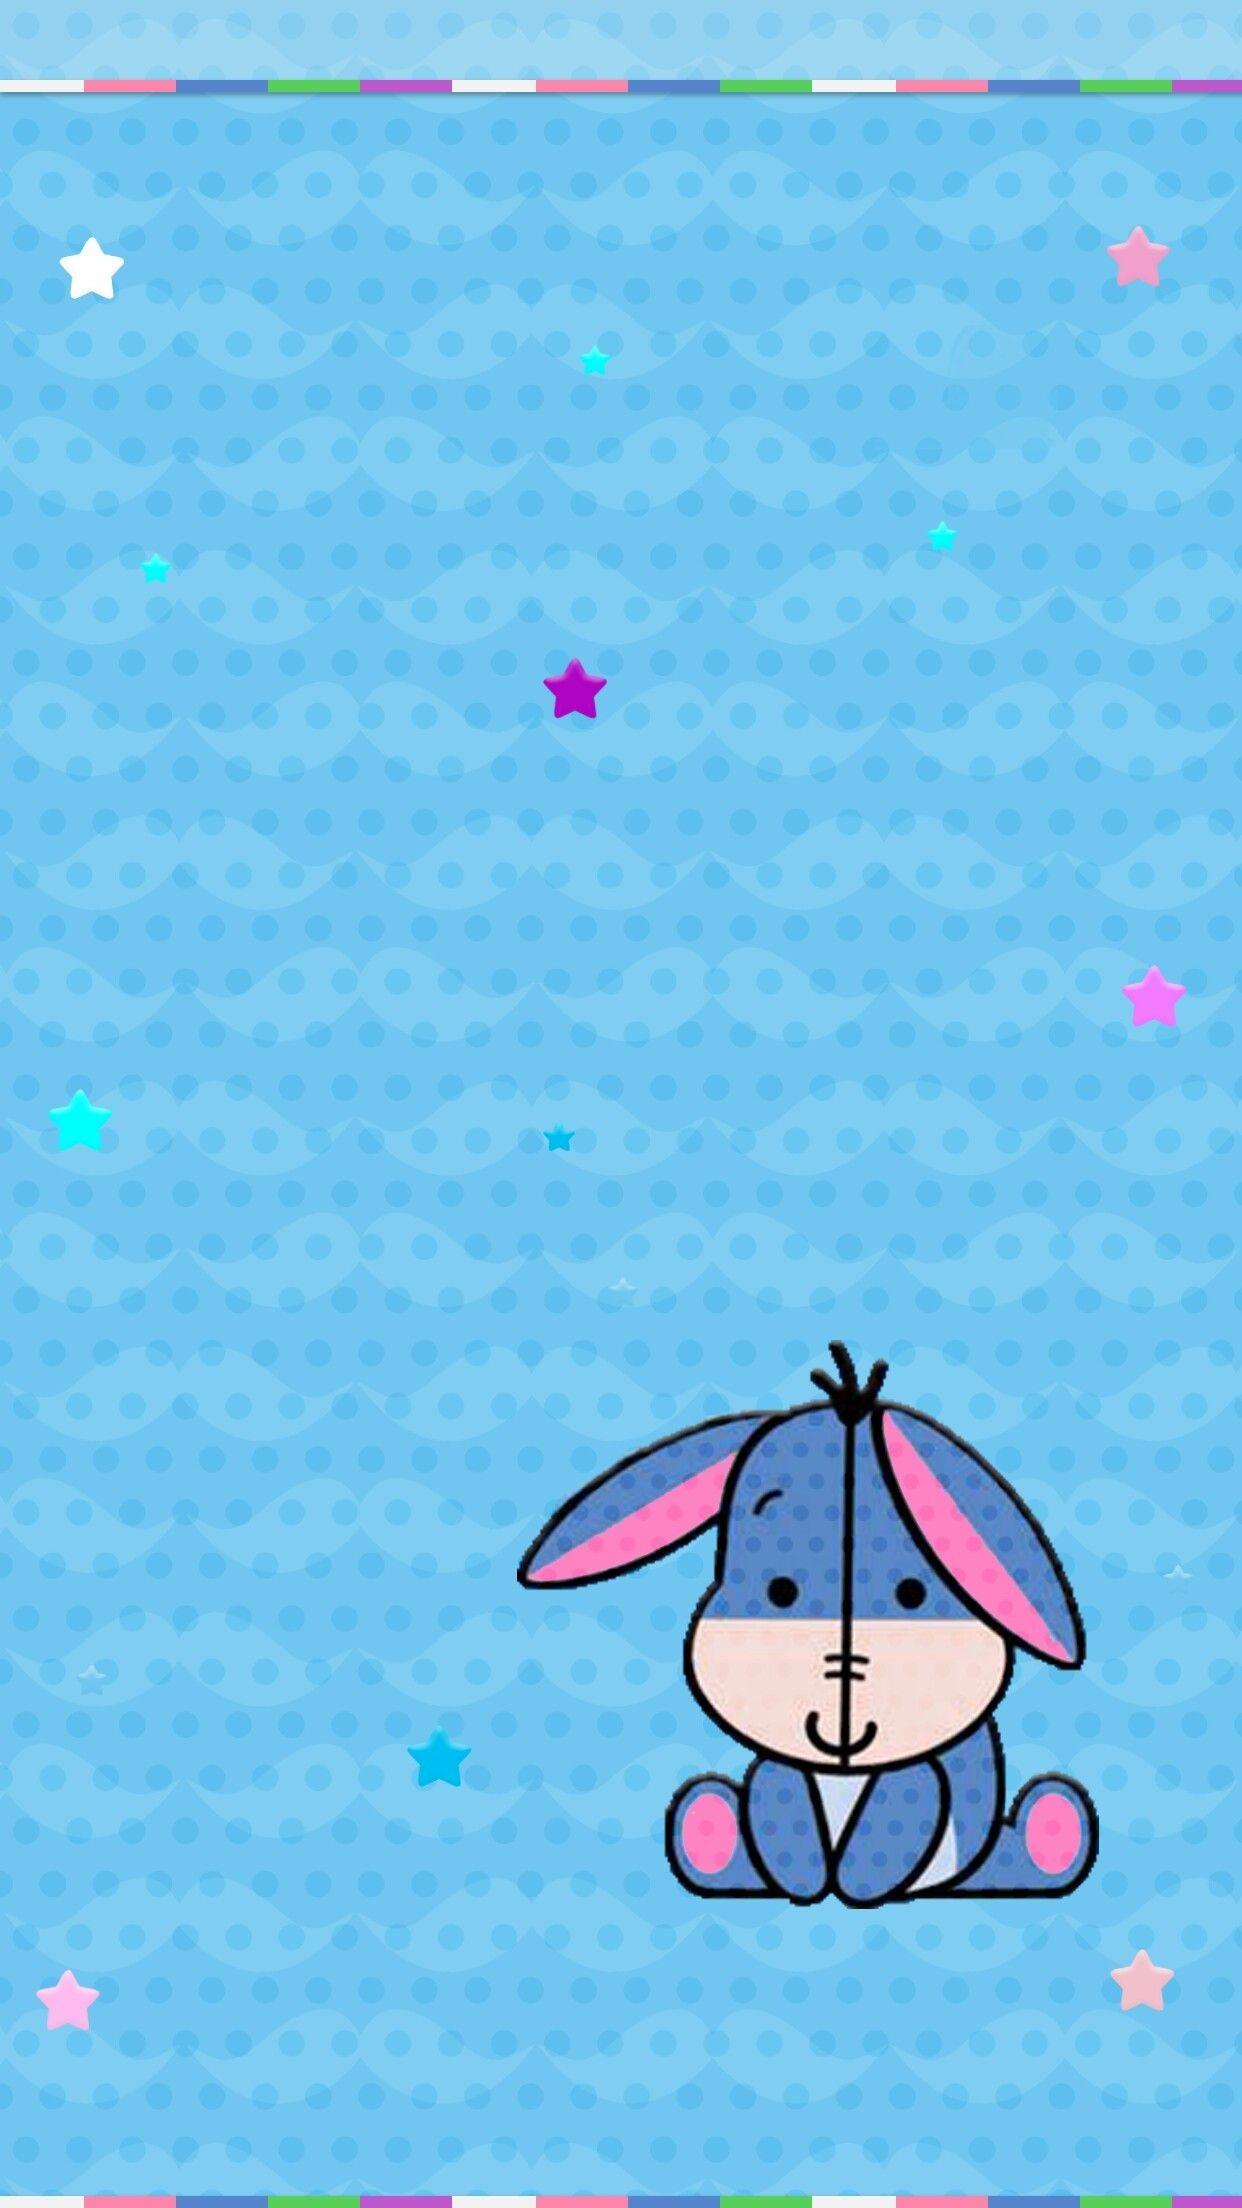 Res: 1242x2208, Disney Phone Wallpaper, Friends Wallpaper, Pooh Bear, Iphone Wallpapers,  Eeyore, Backgrounds, Softies, Wallpapers, Birds